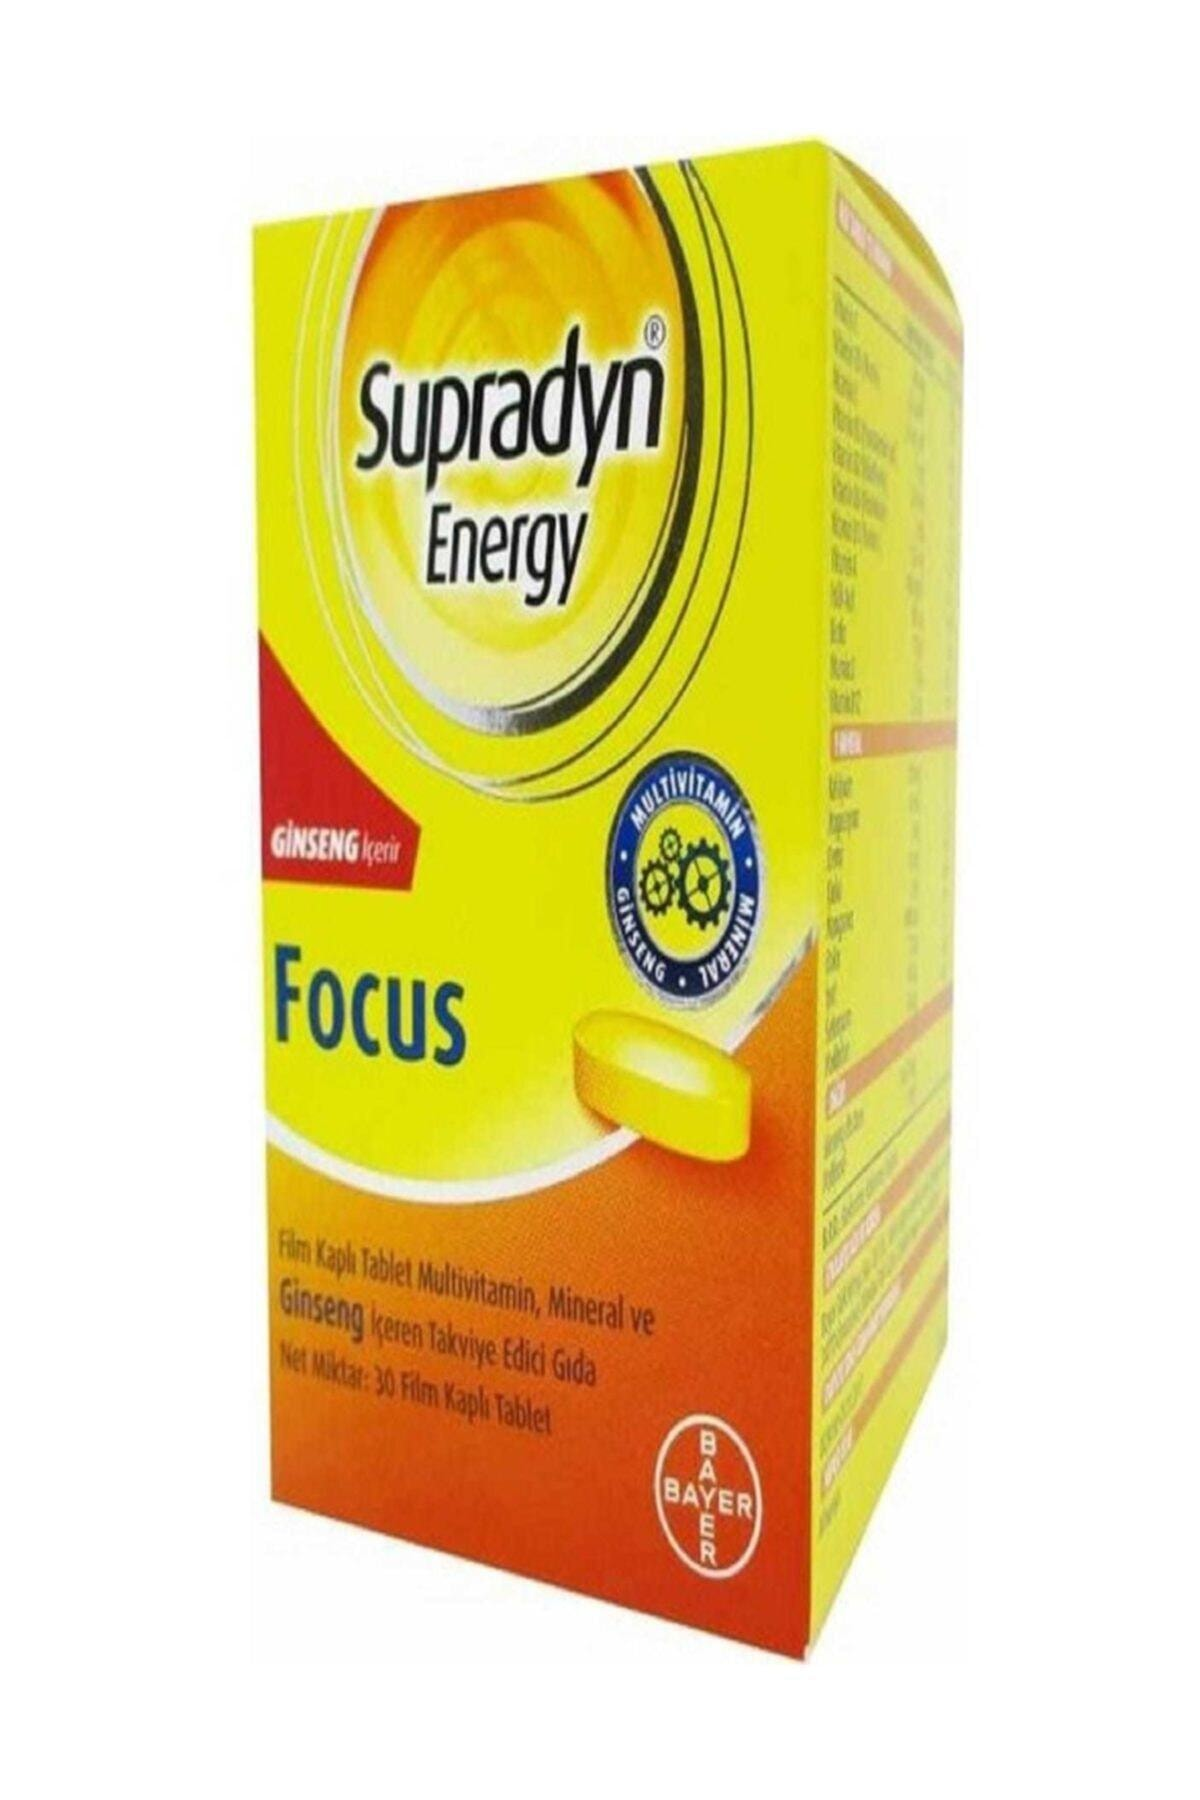 Supradyn Energy Focus Ginseng Içeren Takviye Gıda 30 Film Tablet 1